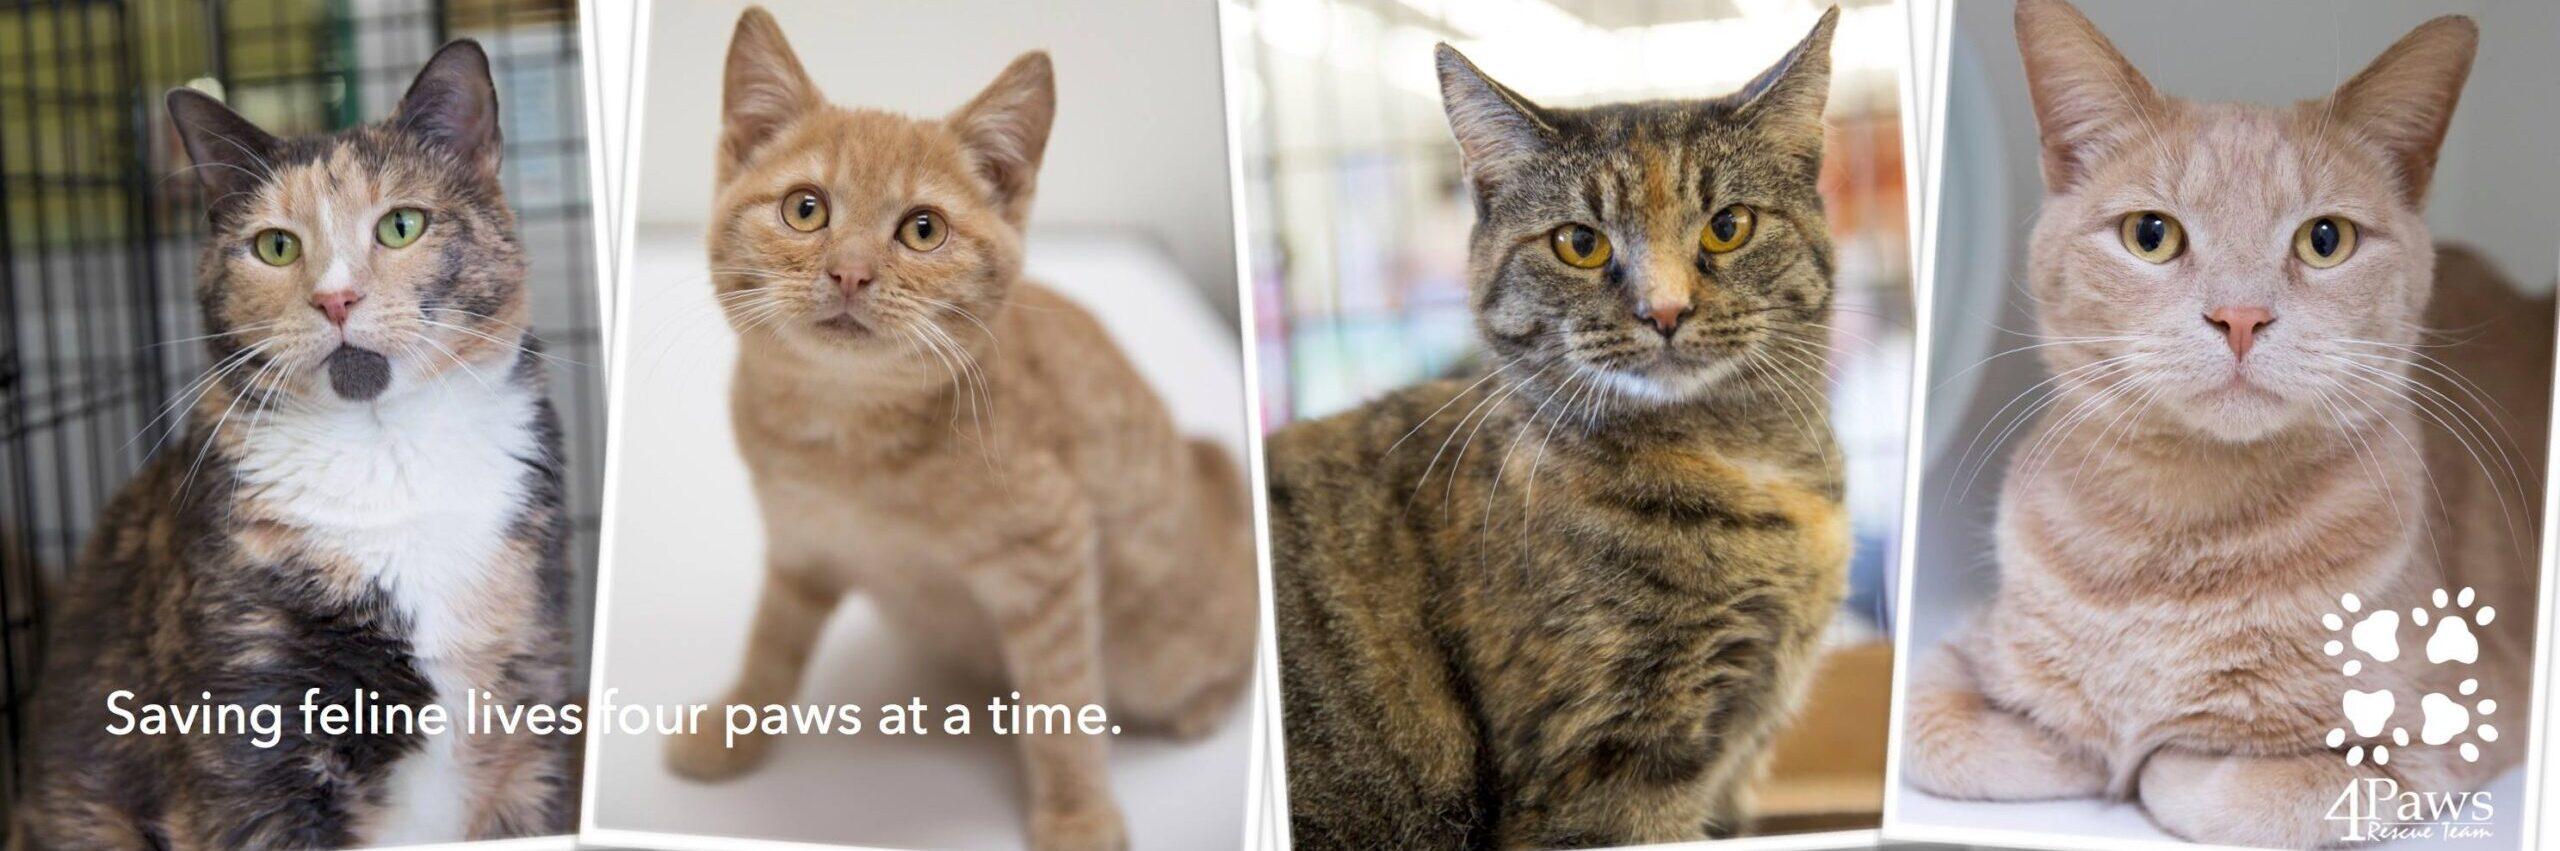 adoptable kittens at fairfax petco